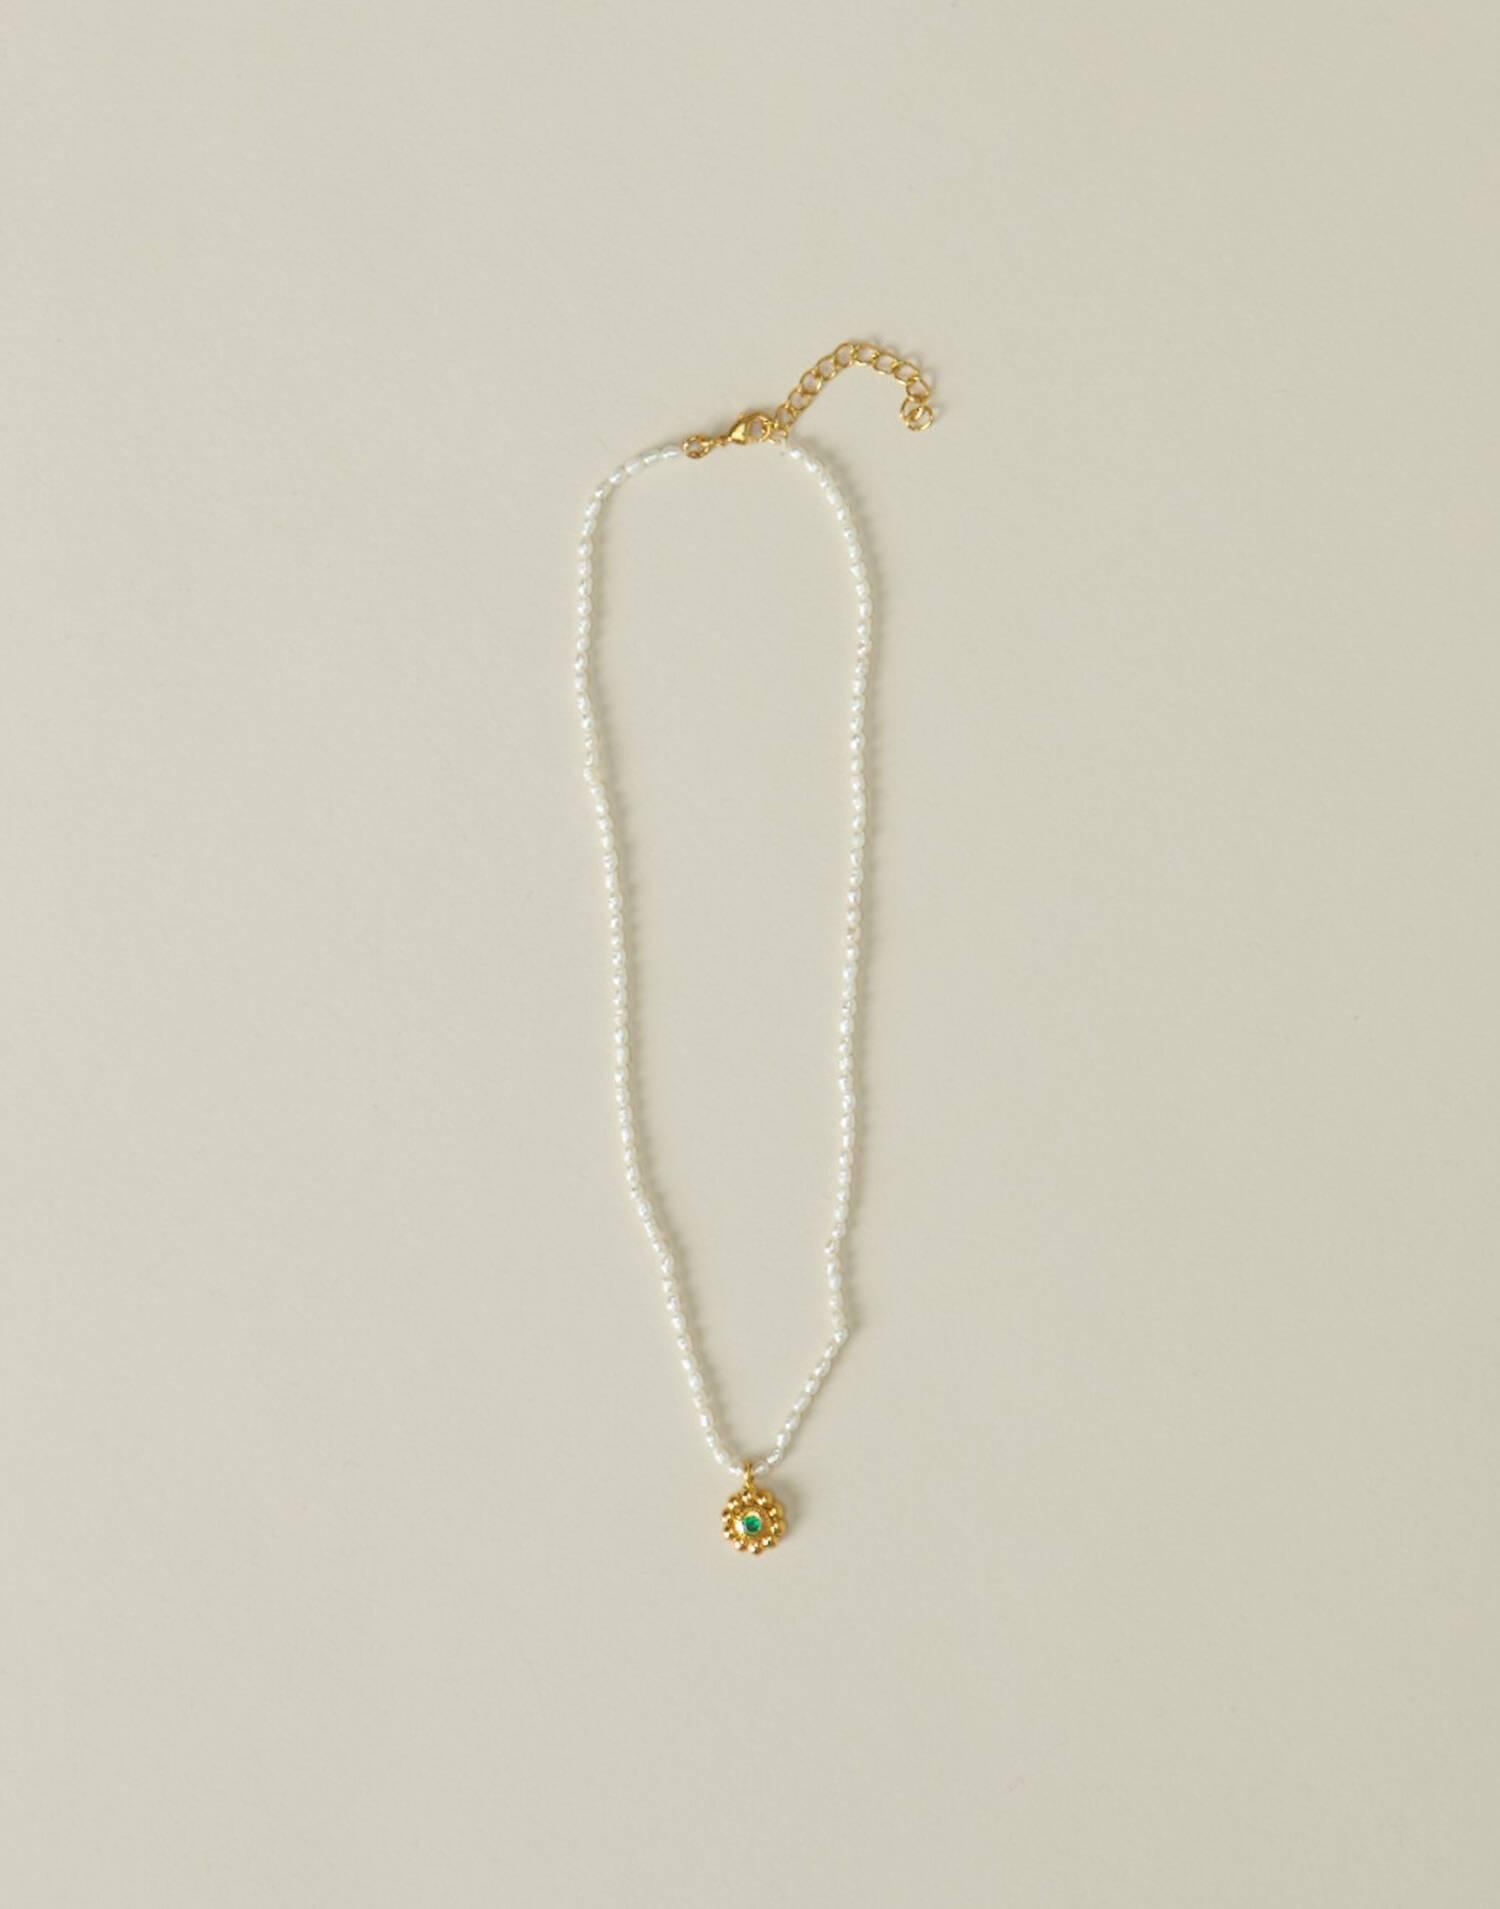 Collar perlas colgante flor baño de oro